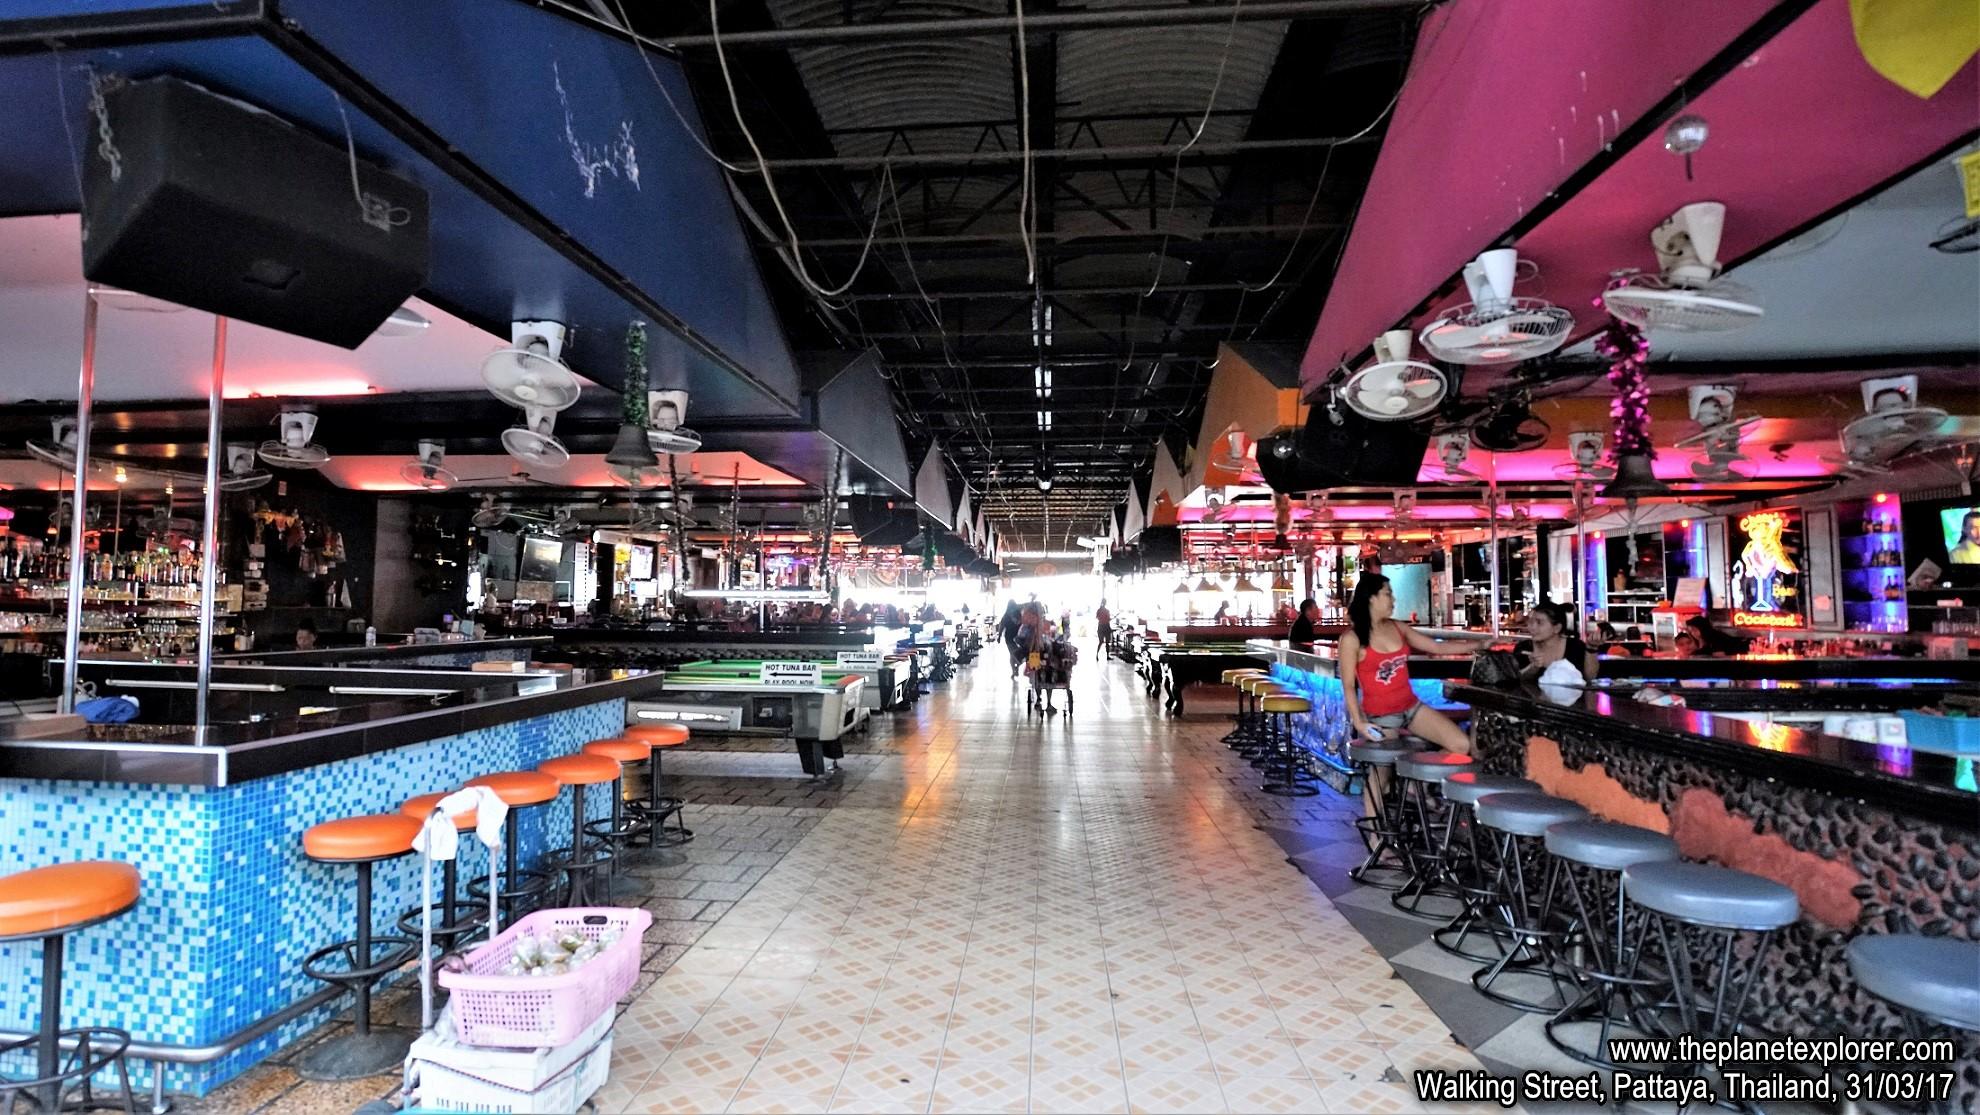 2017-03-31_1758_Thailand_Pattaya_Walking Street_DSC03997_s7R2_LR_@